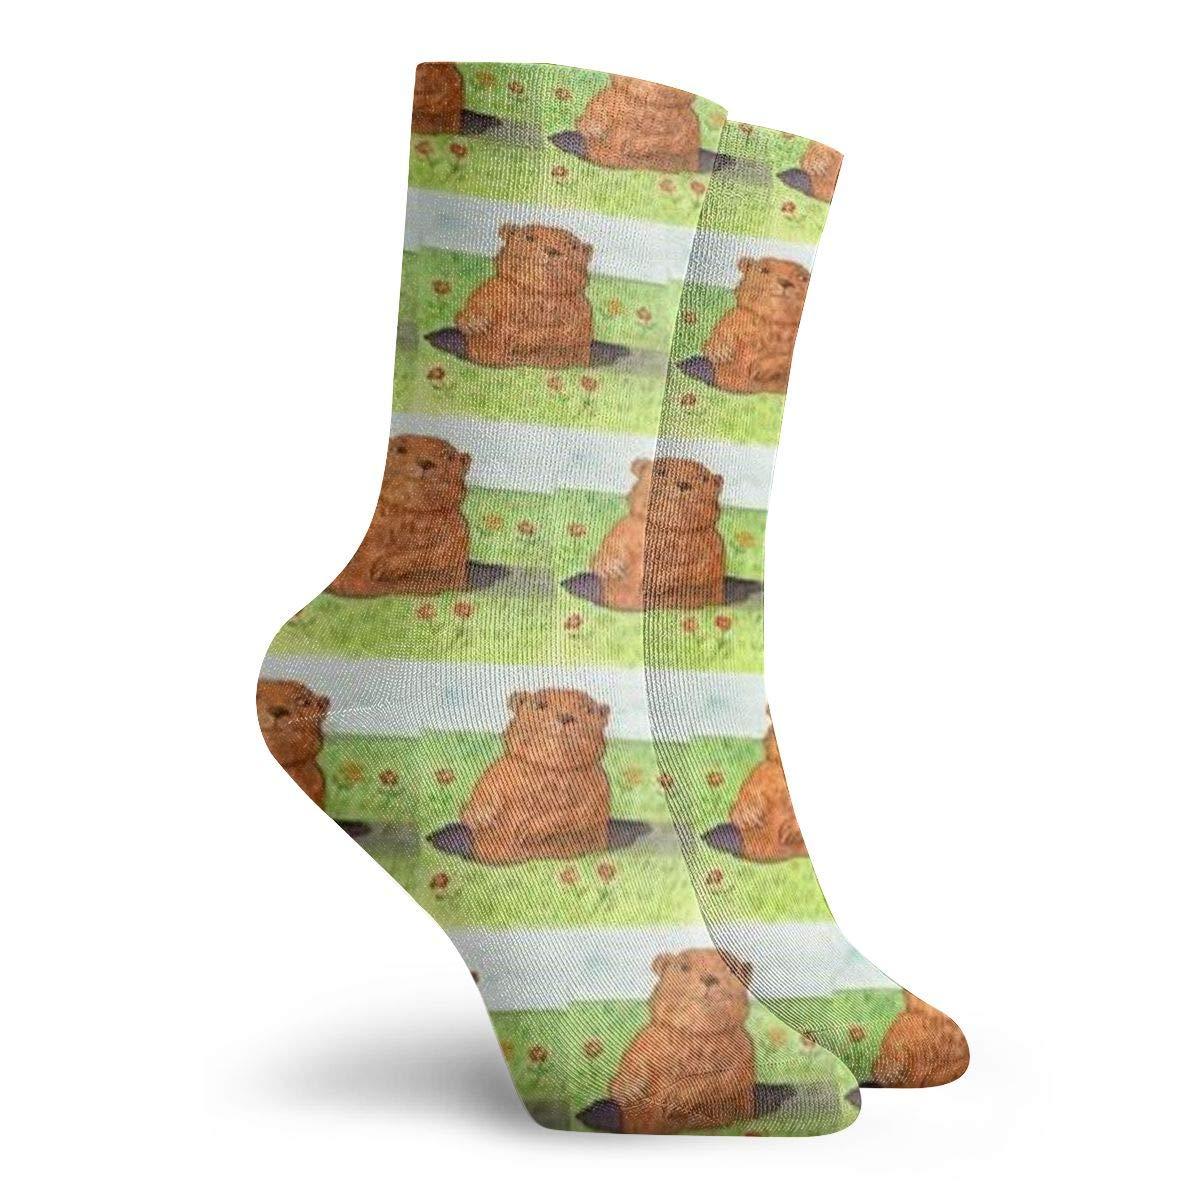 Jokerbilibili Whimsical Groundhog Day Out Unisex Print Athletic Quarter//Ankle Running Hiking Socks-Weekend Lounge Short Crew Socks